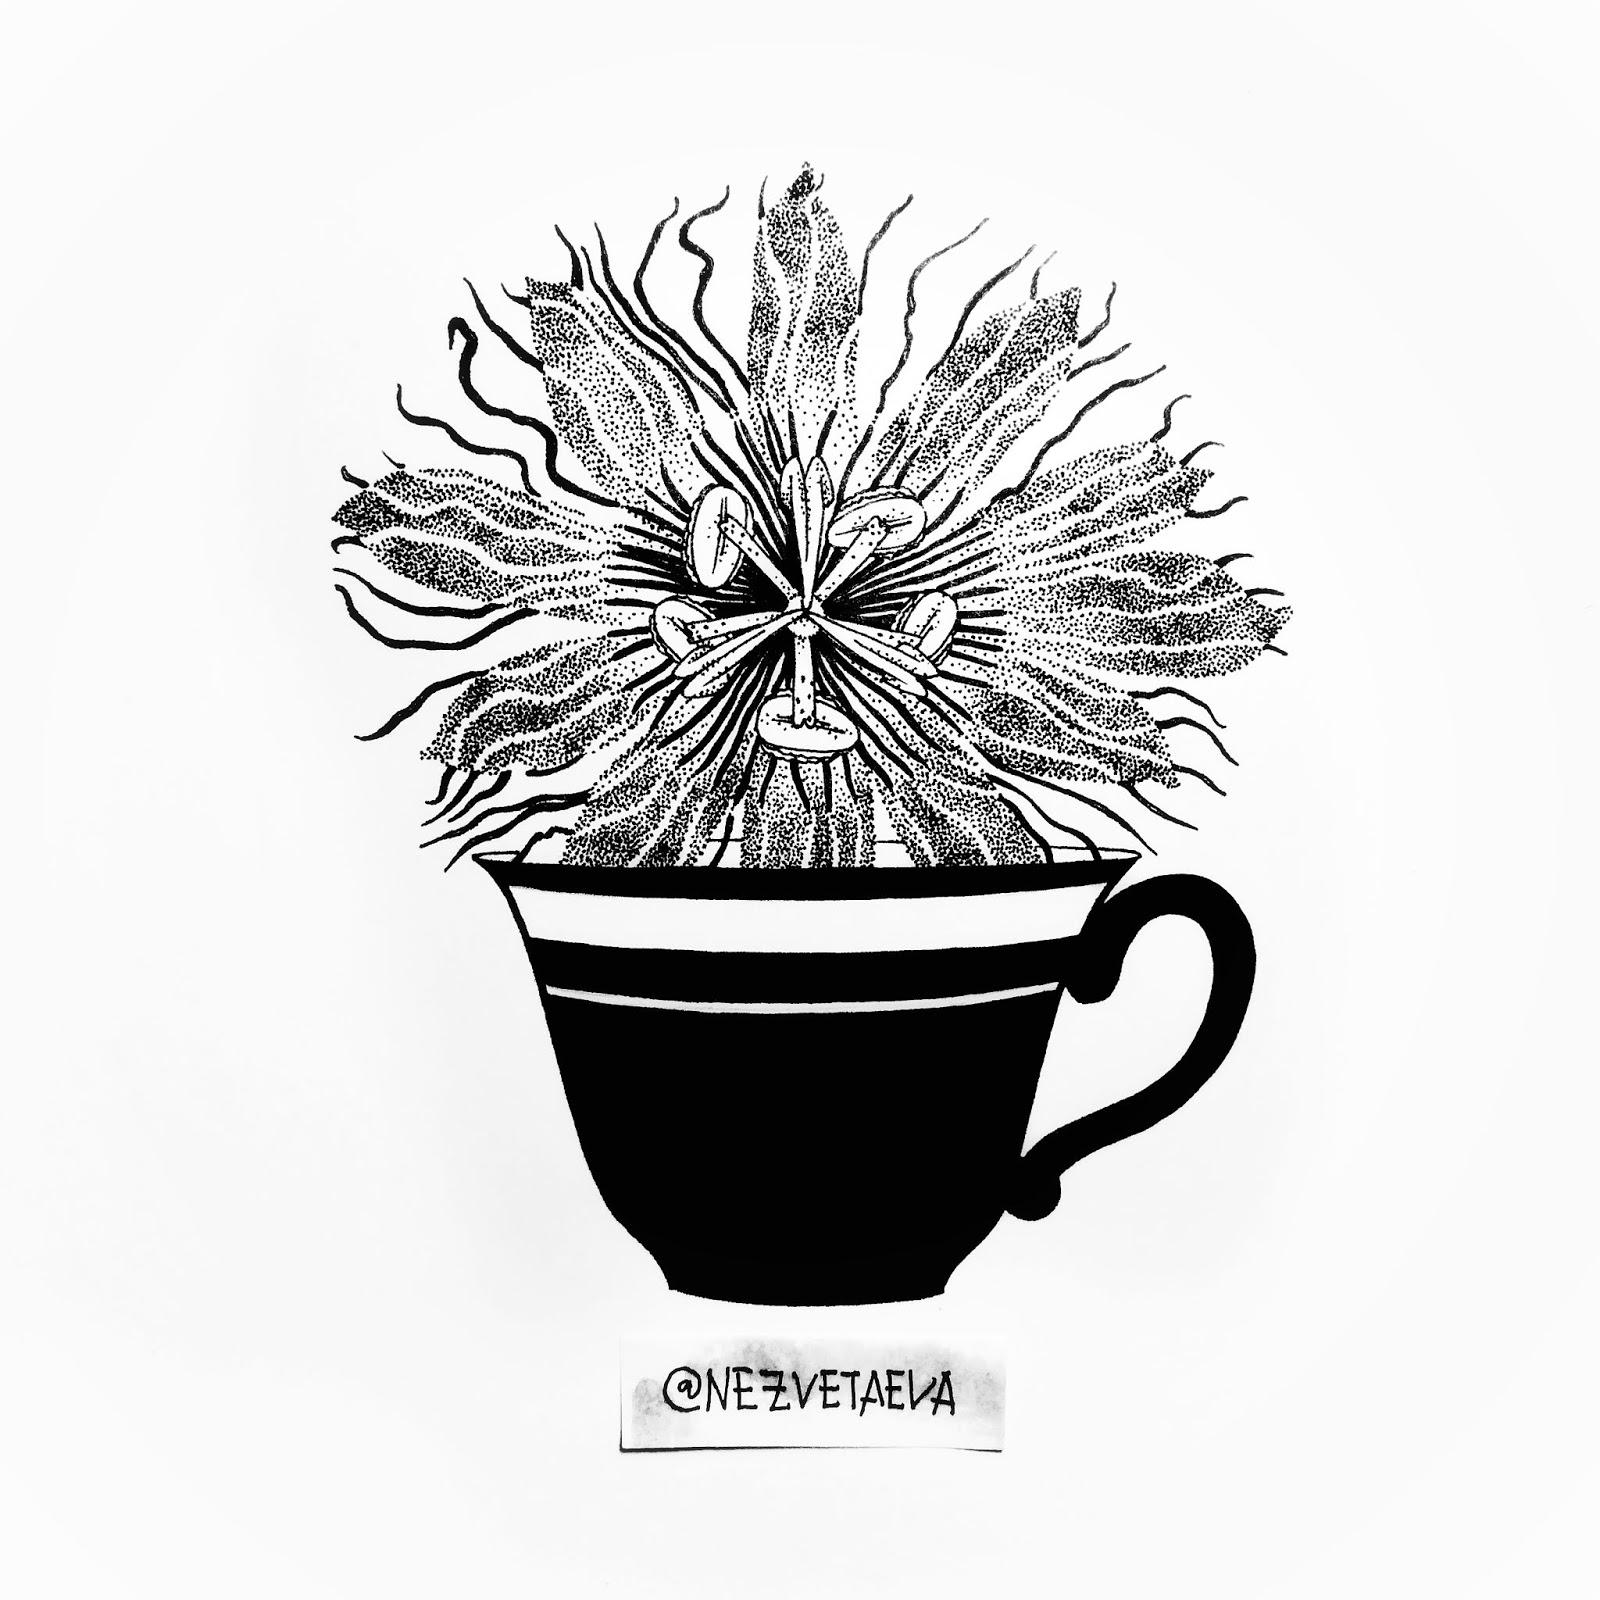 sonia-nezvetaeva-inktober2018-passiflora-dotwork-sketch